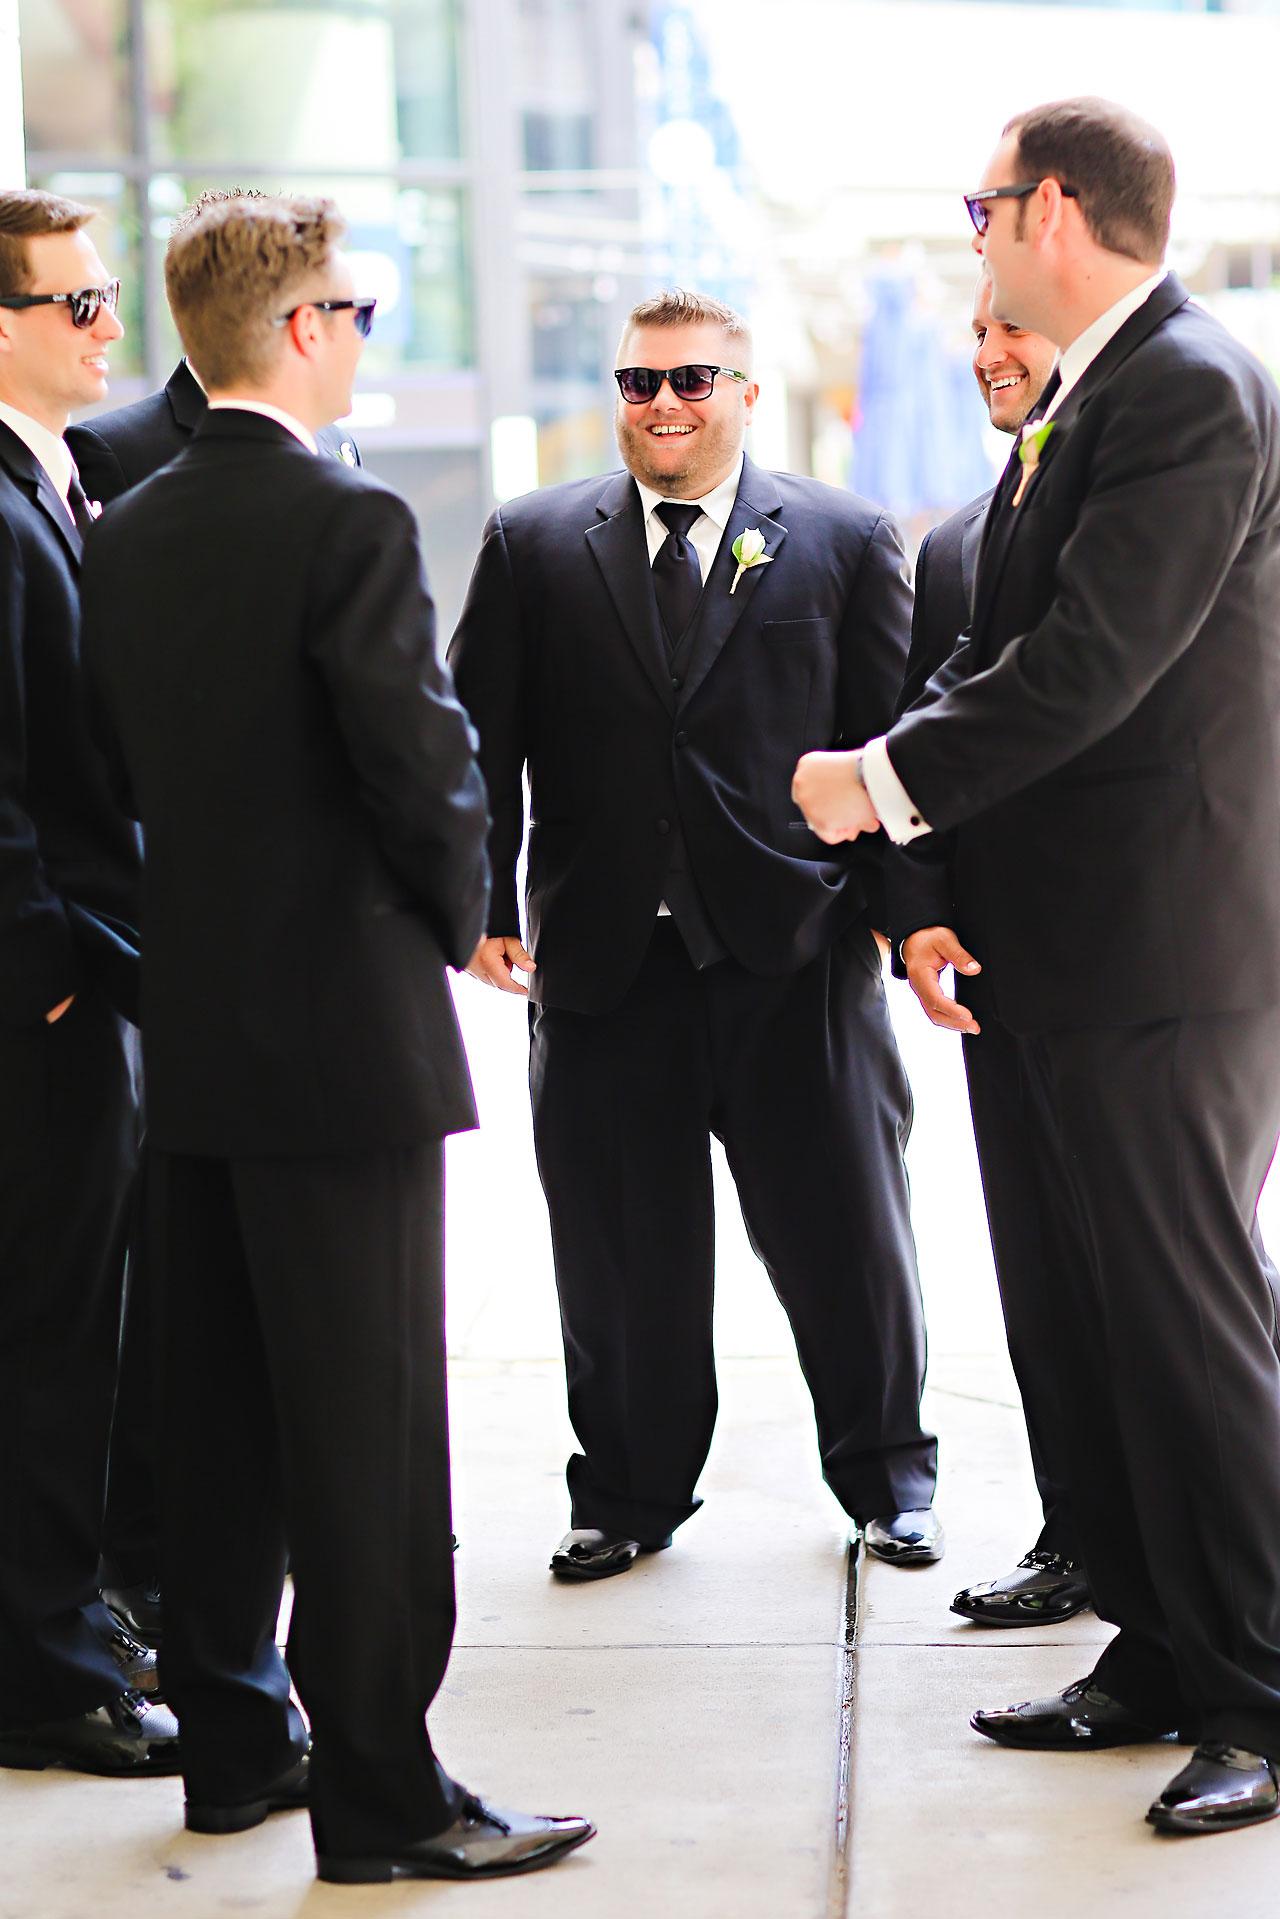 Kim Spencer Indiana Roof Ballroom Wedding 082